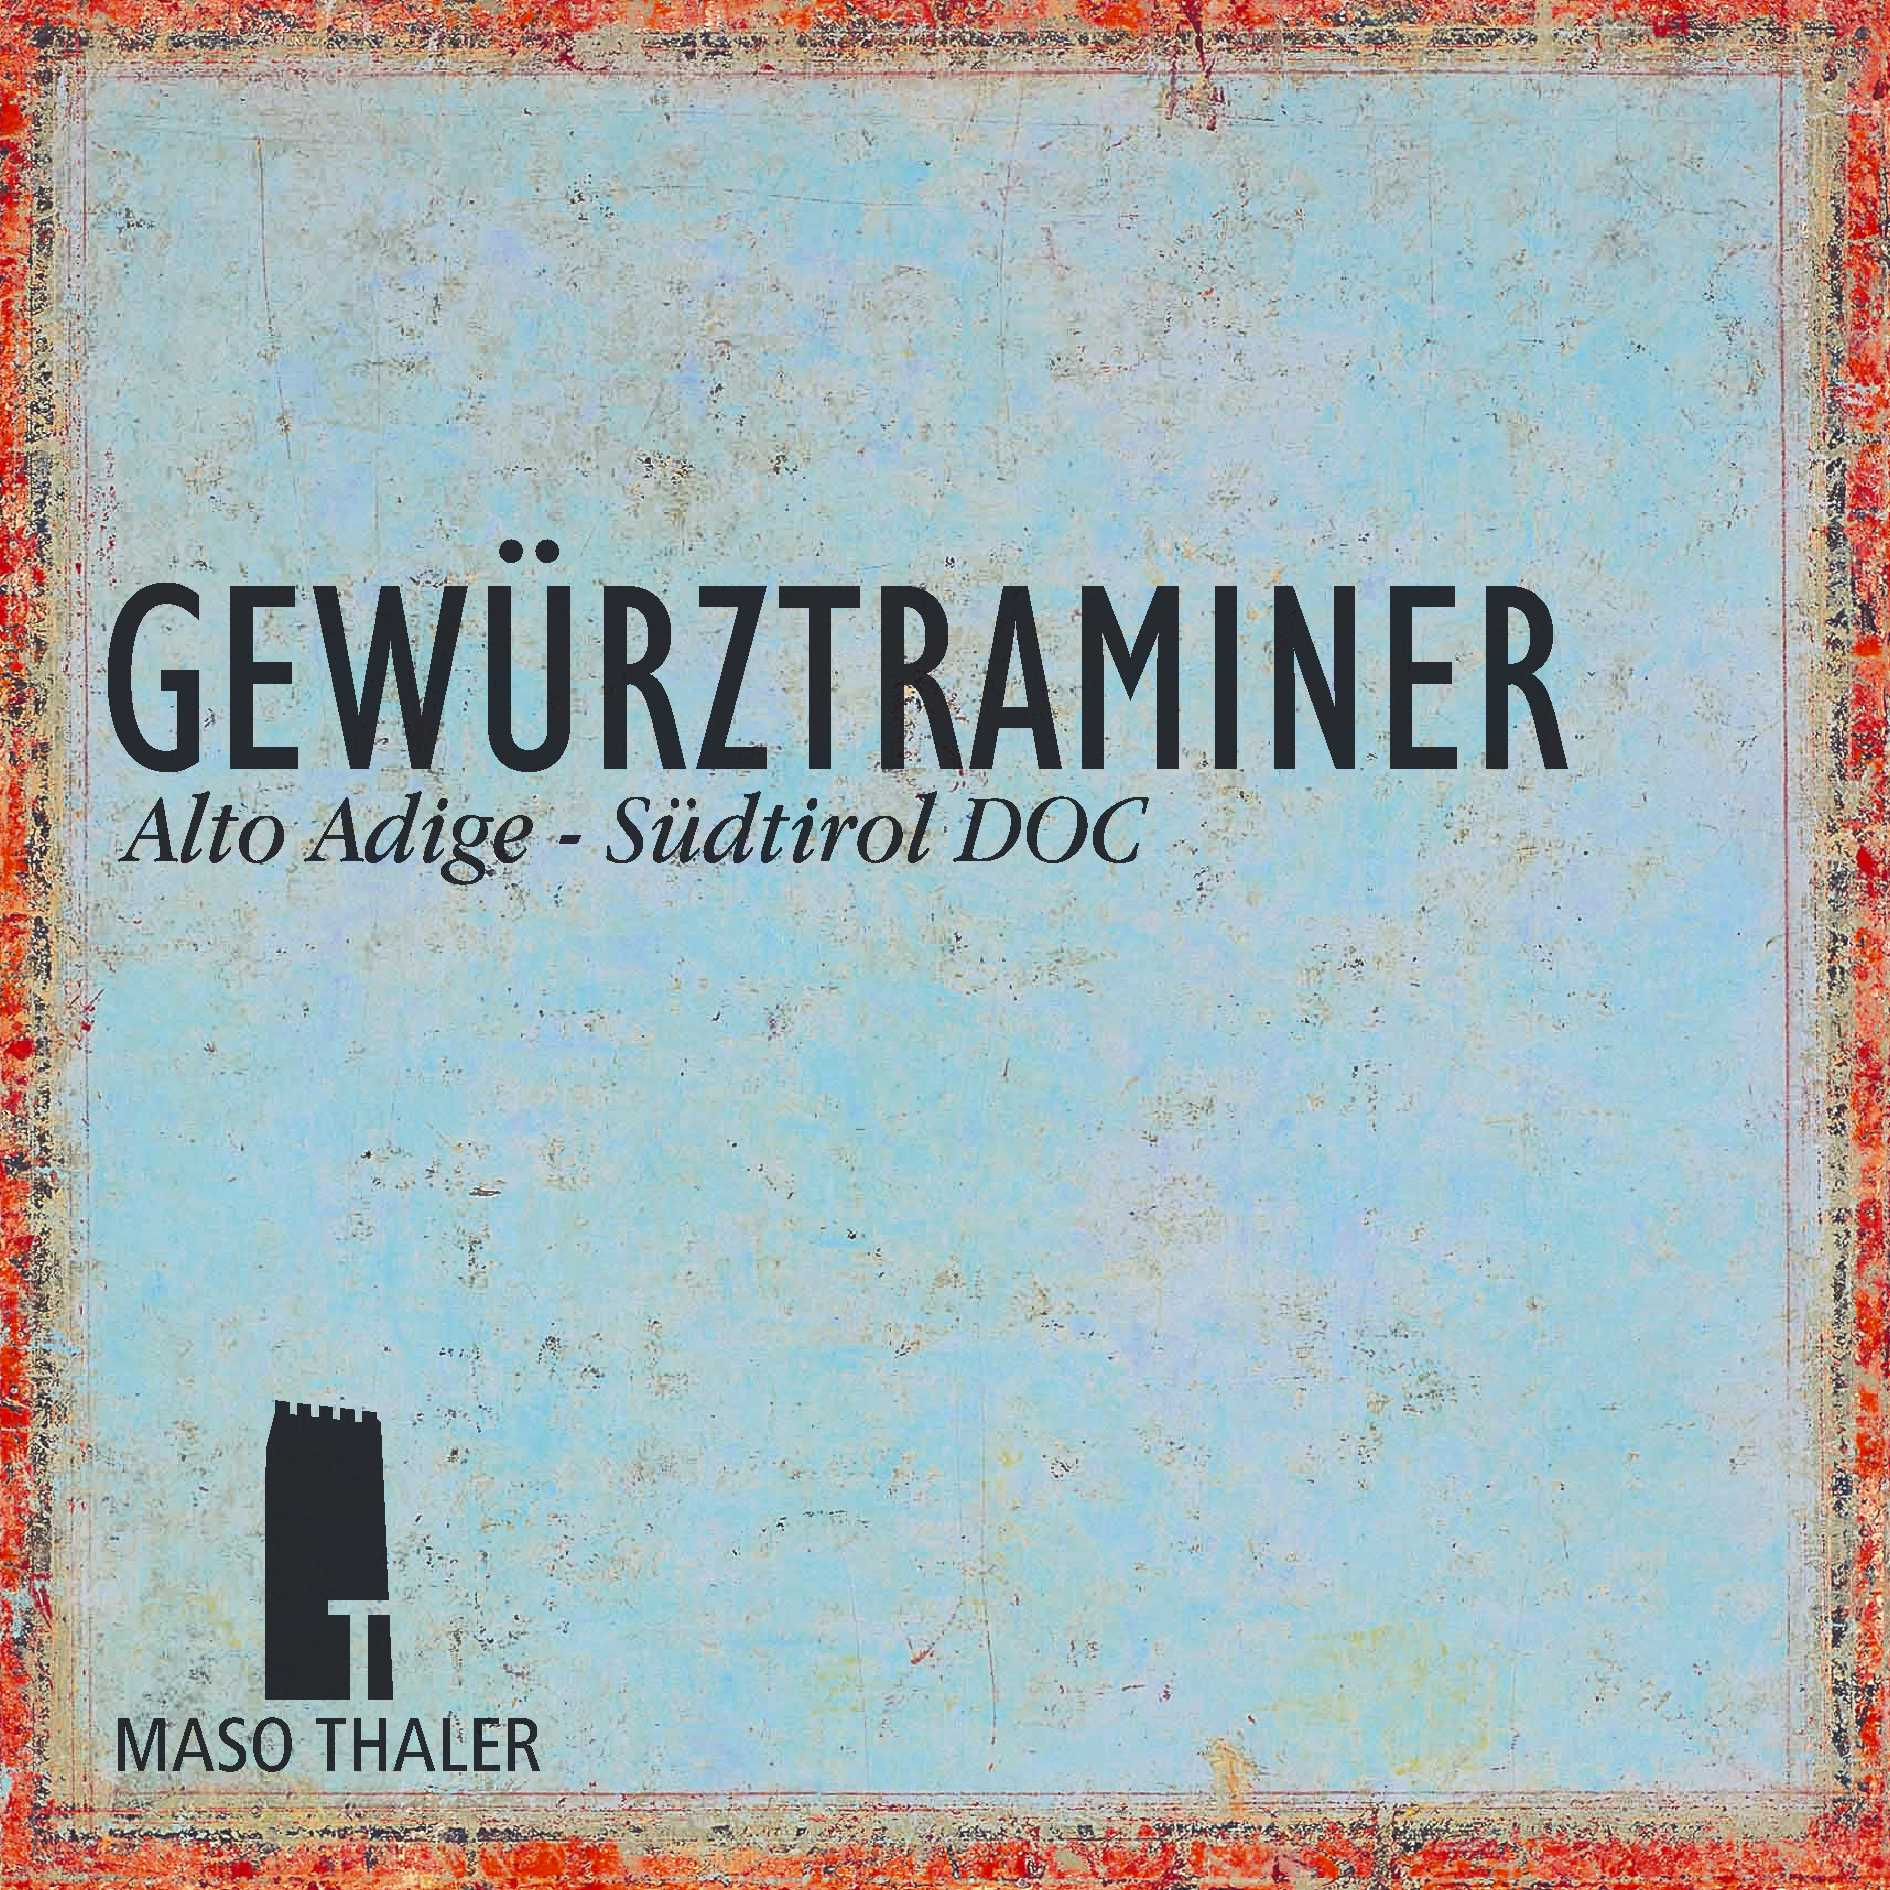 - Il nuovo arrivato: Gewürztraminer 2018!Alto-Adige / Südtirol